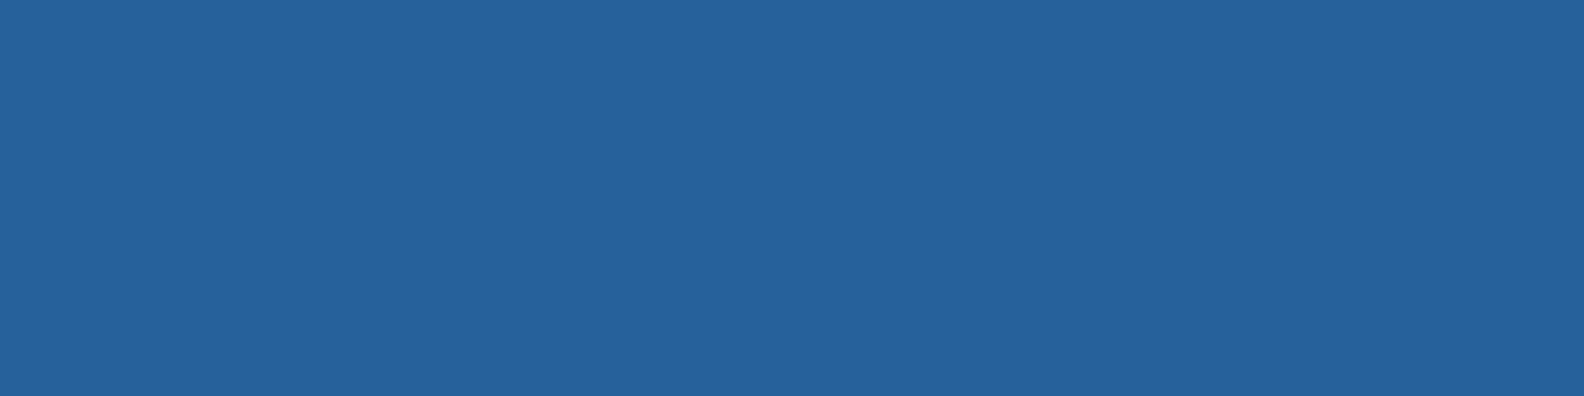 1584x396 Lapis Lazuli Solid Color Background